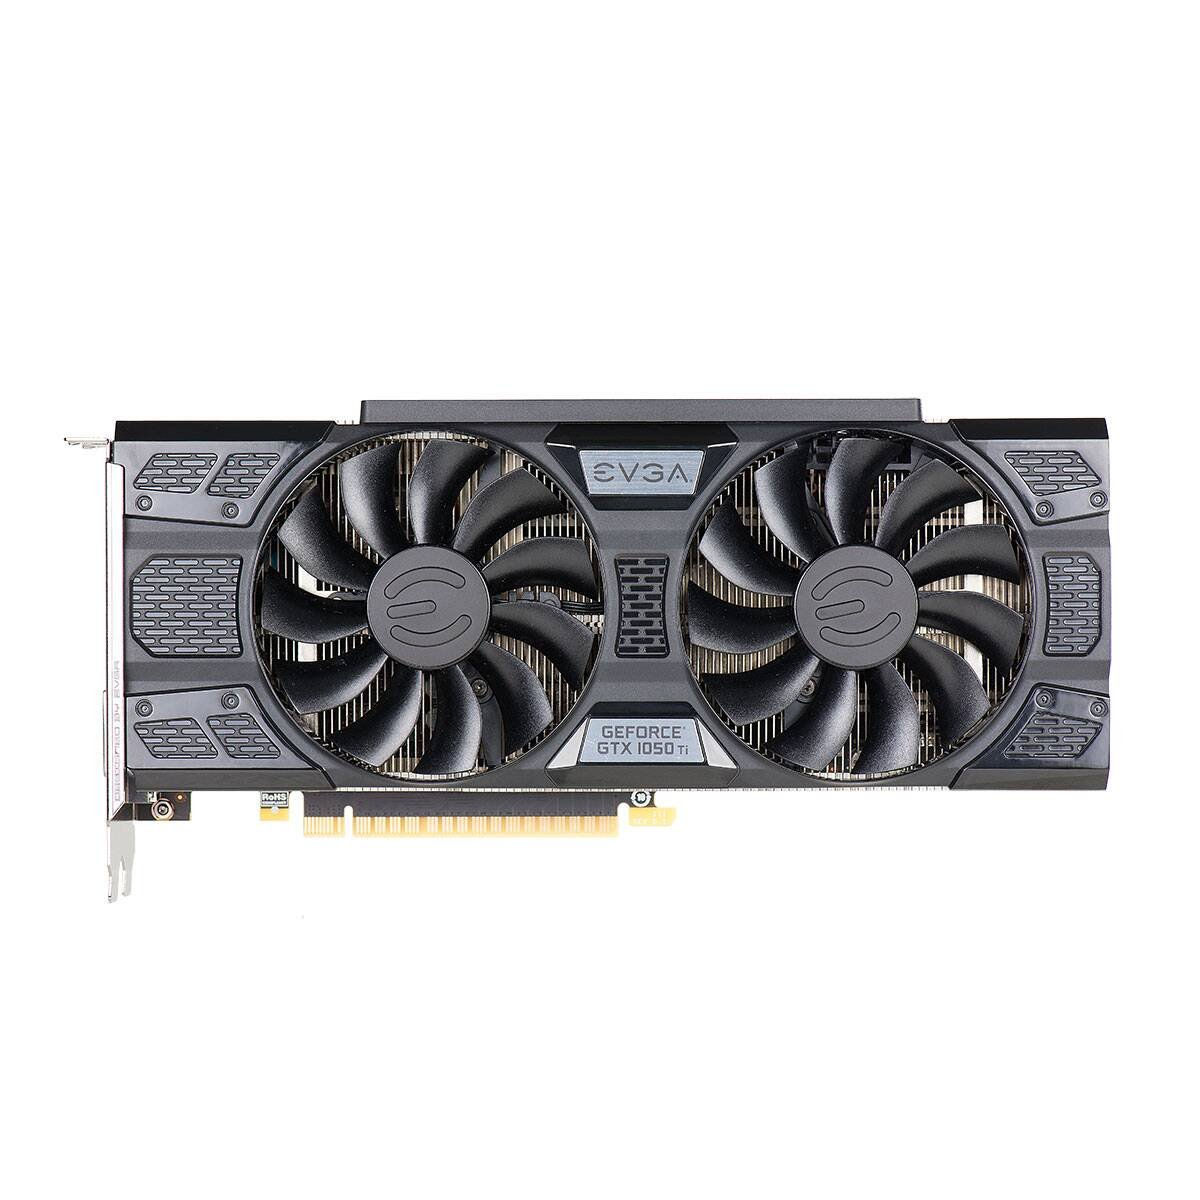 EVGA GeForce GTX 1050 Ti FTW ACX 3.0, 4 GB GDDR5, DX12 OSD (PXOC) Tarjeta Grafica 04G-P4-6258-KR